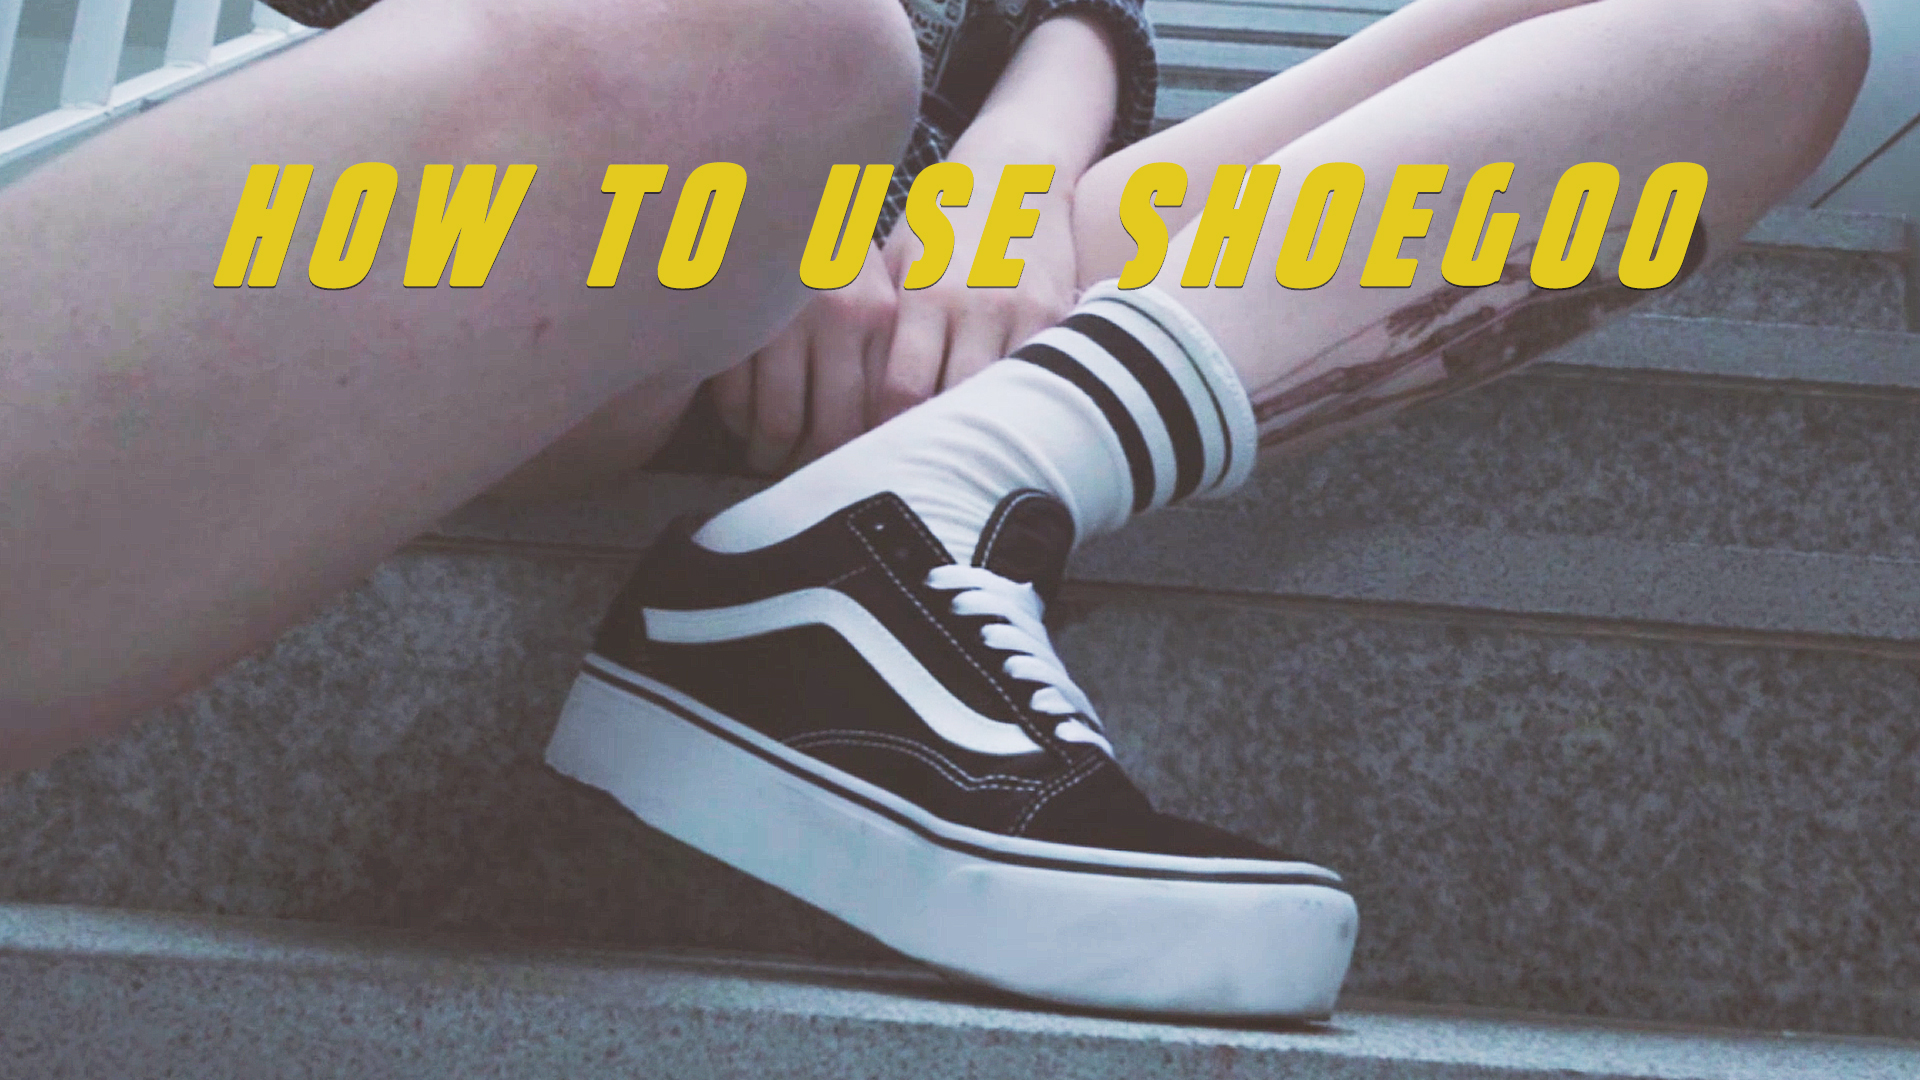 EUNBI✟How to use shoe goo on VANS skate shoes 신발 뒤꿈치 까짐없이 오래신자! 슈구 바르는법